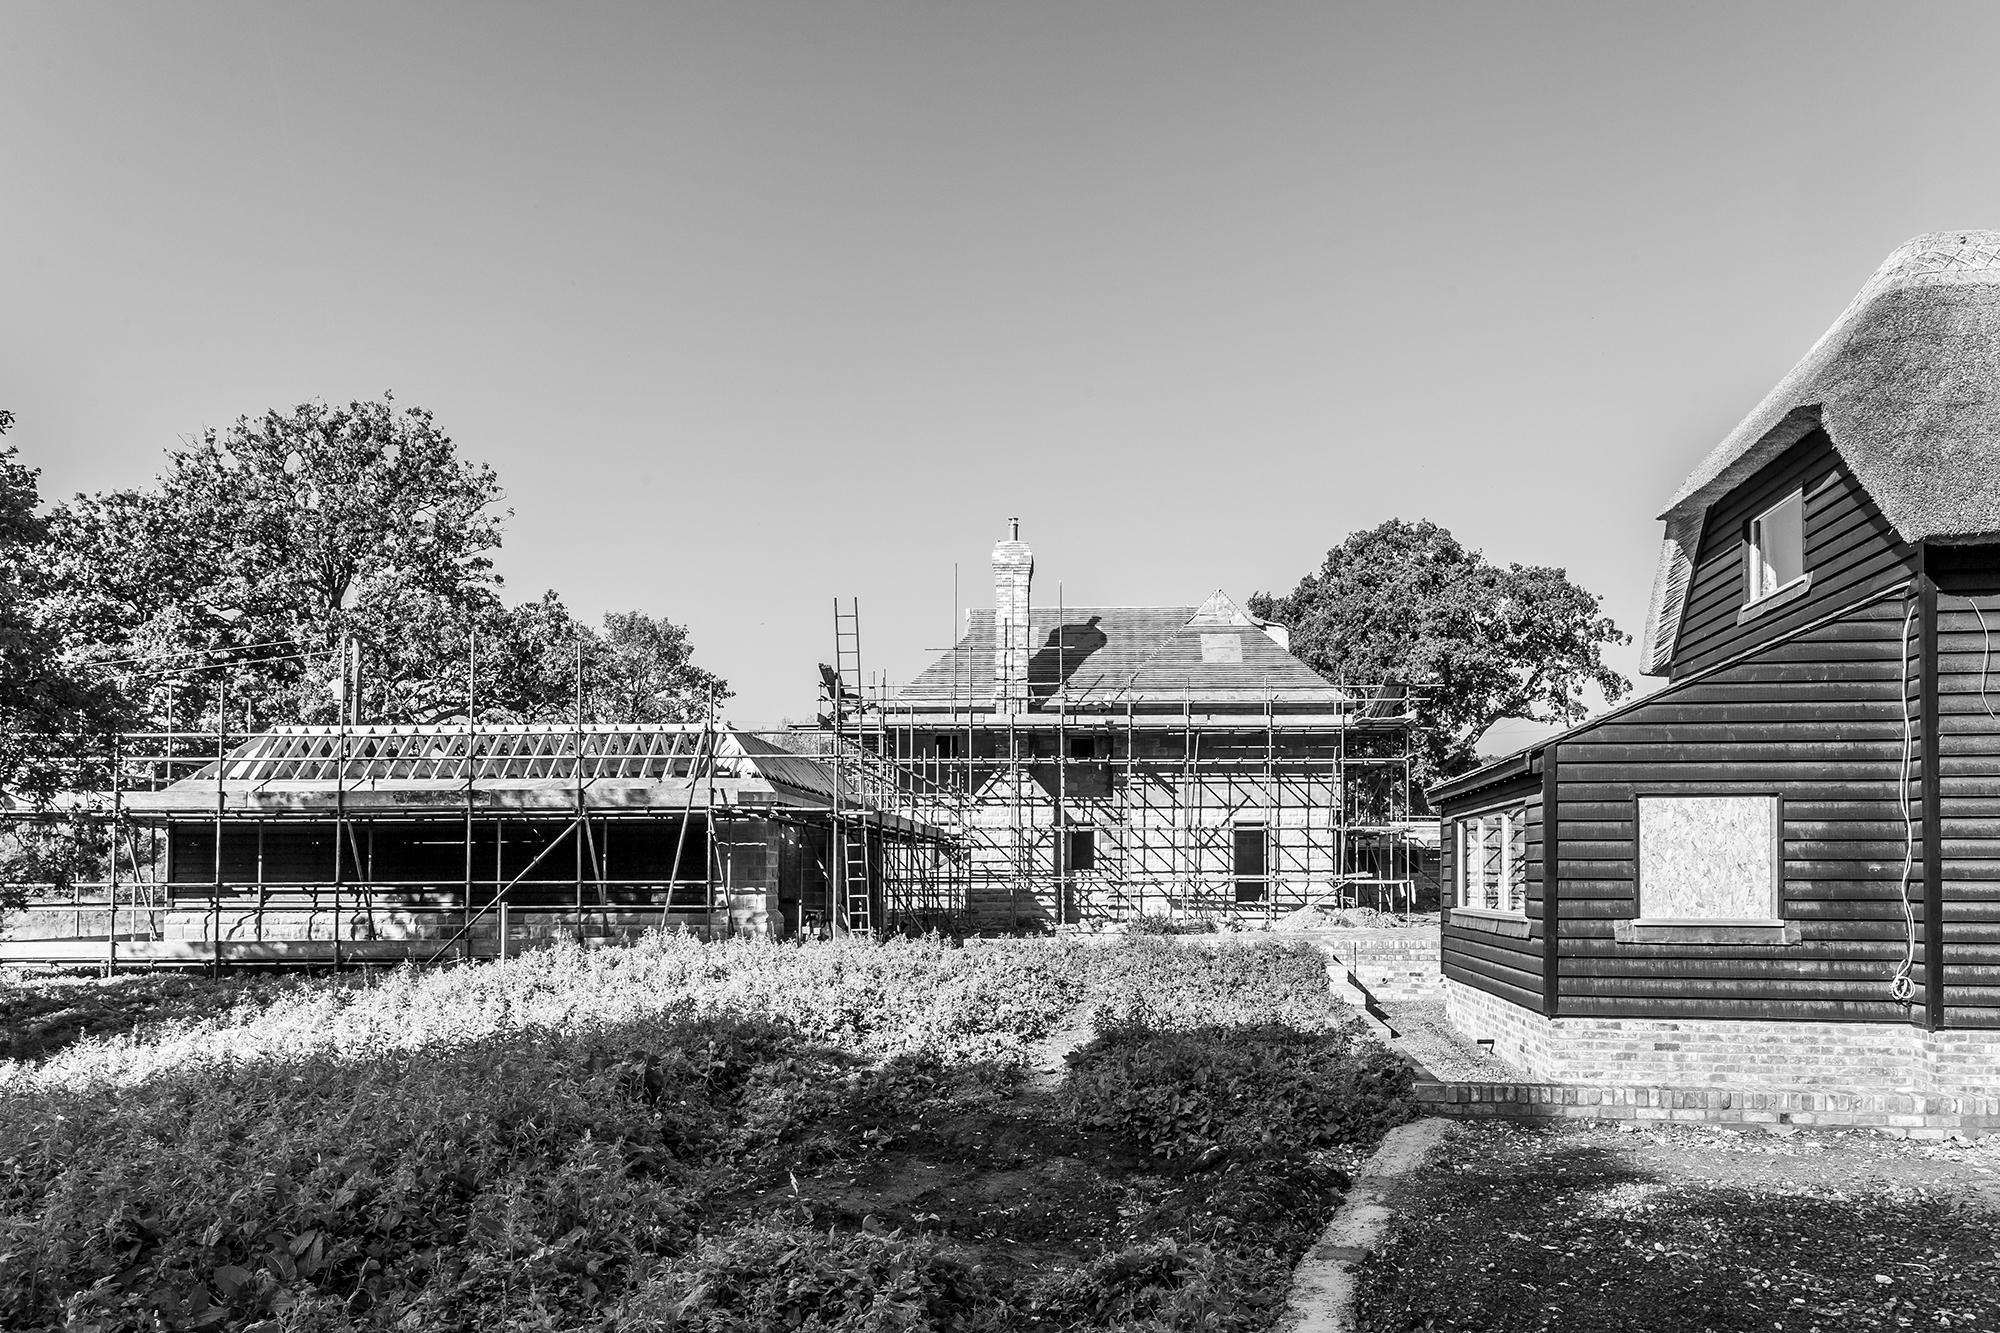 Homefields_Construction2_03.jpg